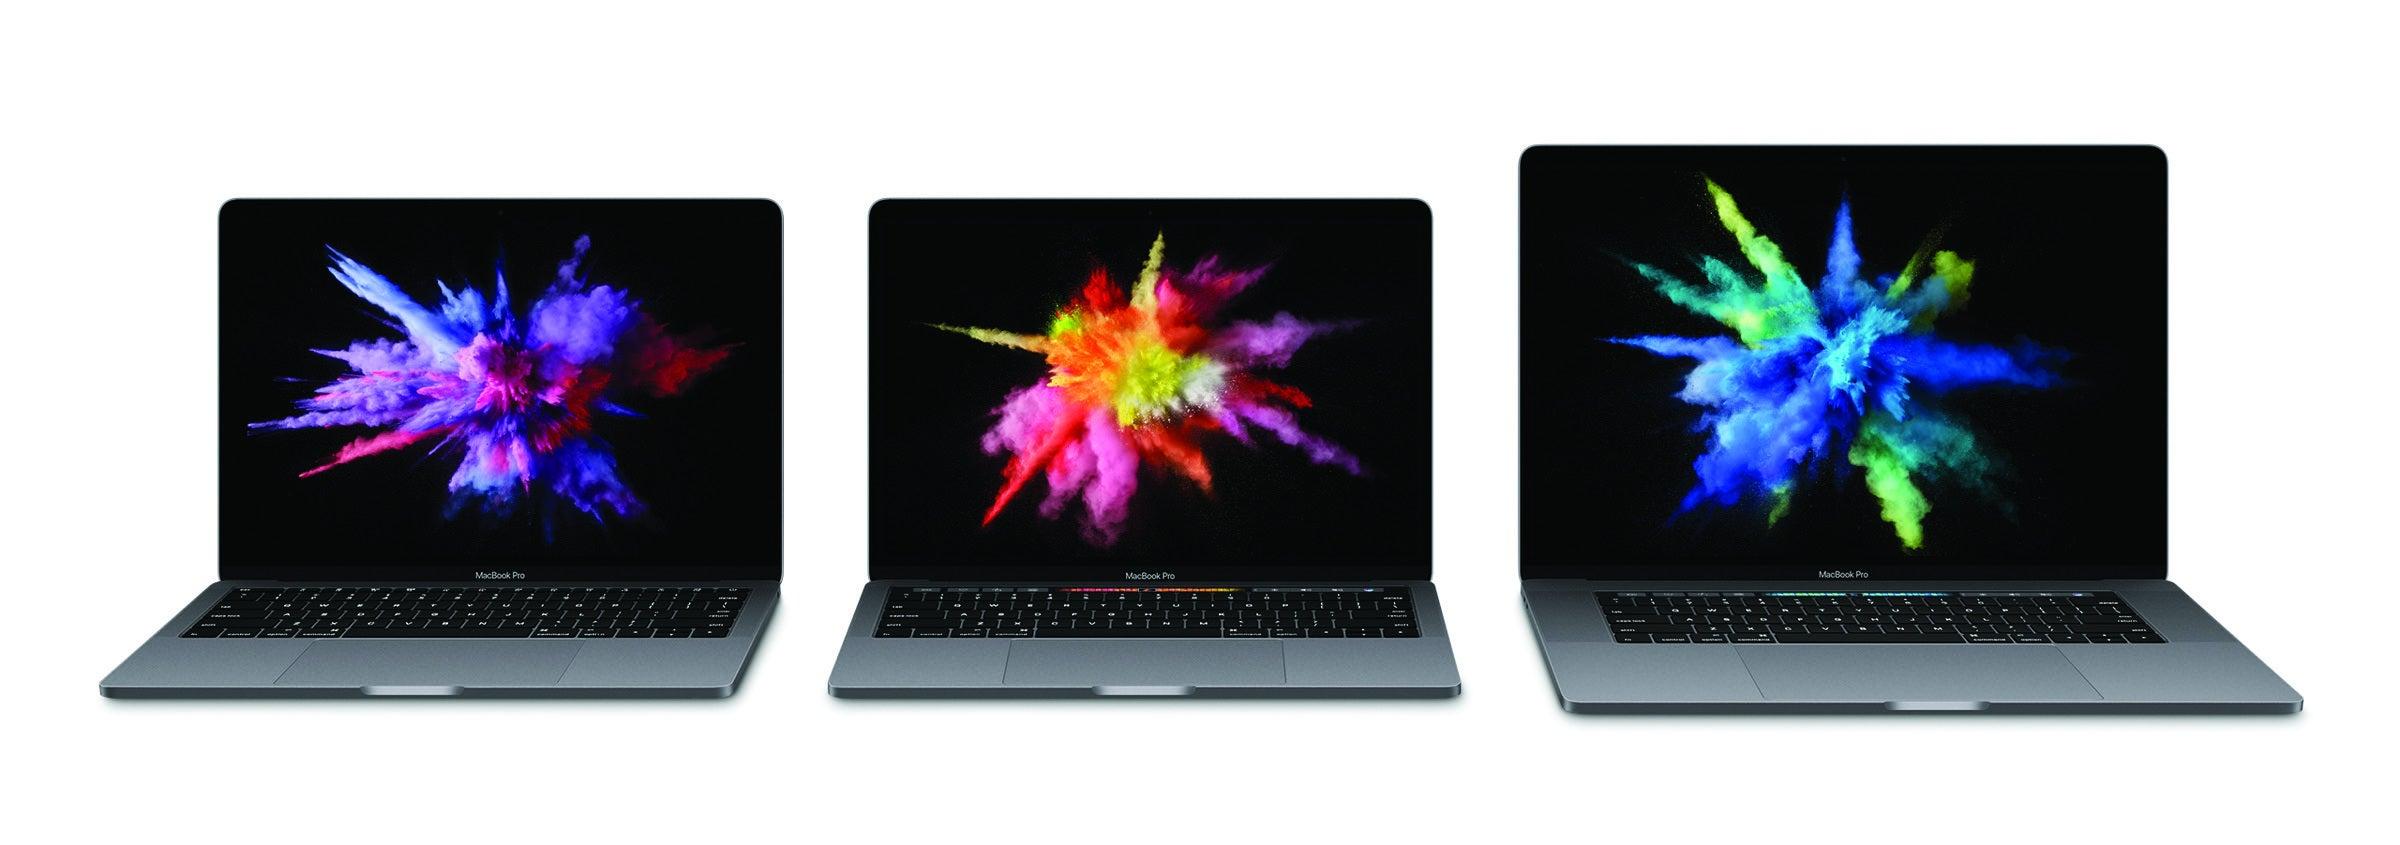 13-inch MacBook Pro review: Too many tradeoffs | Macworld